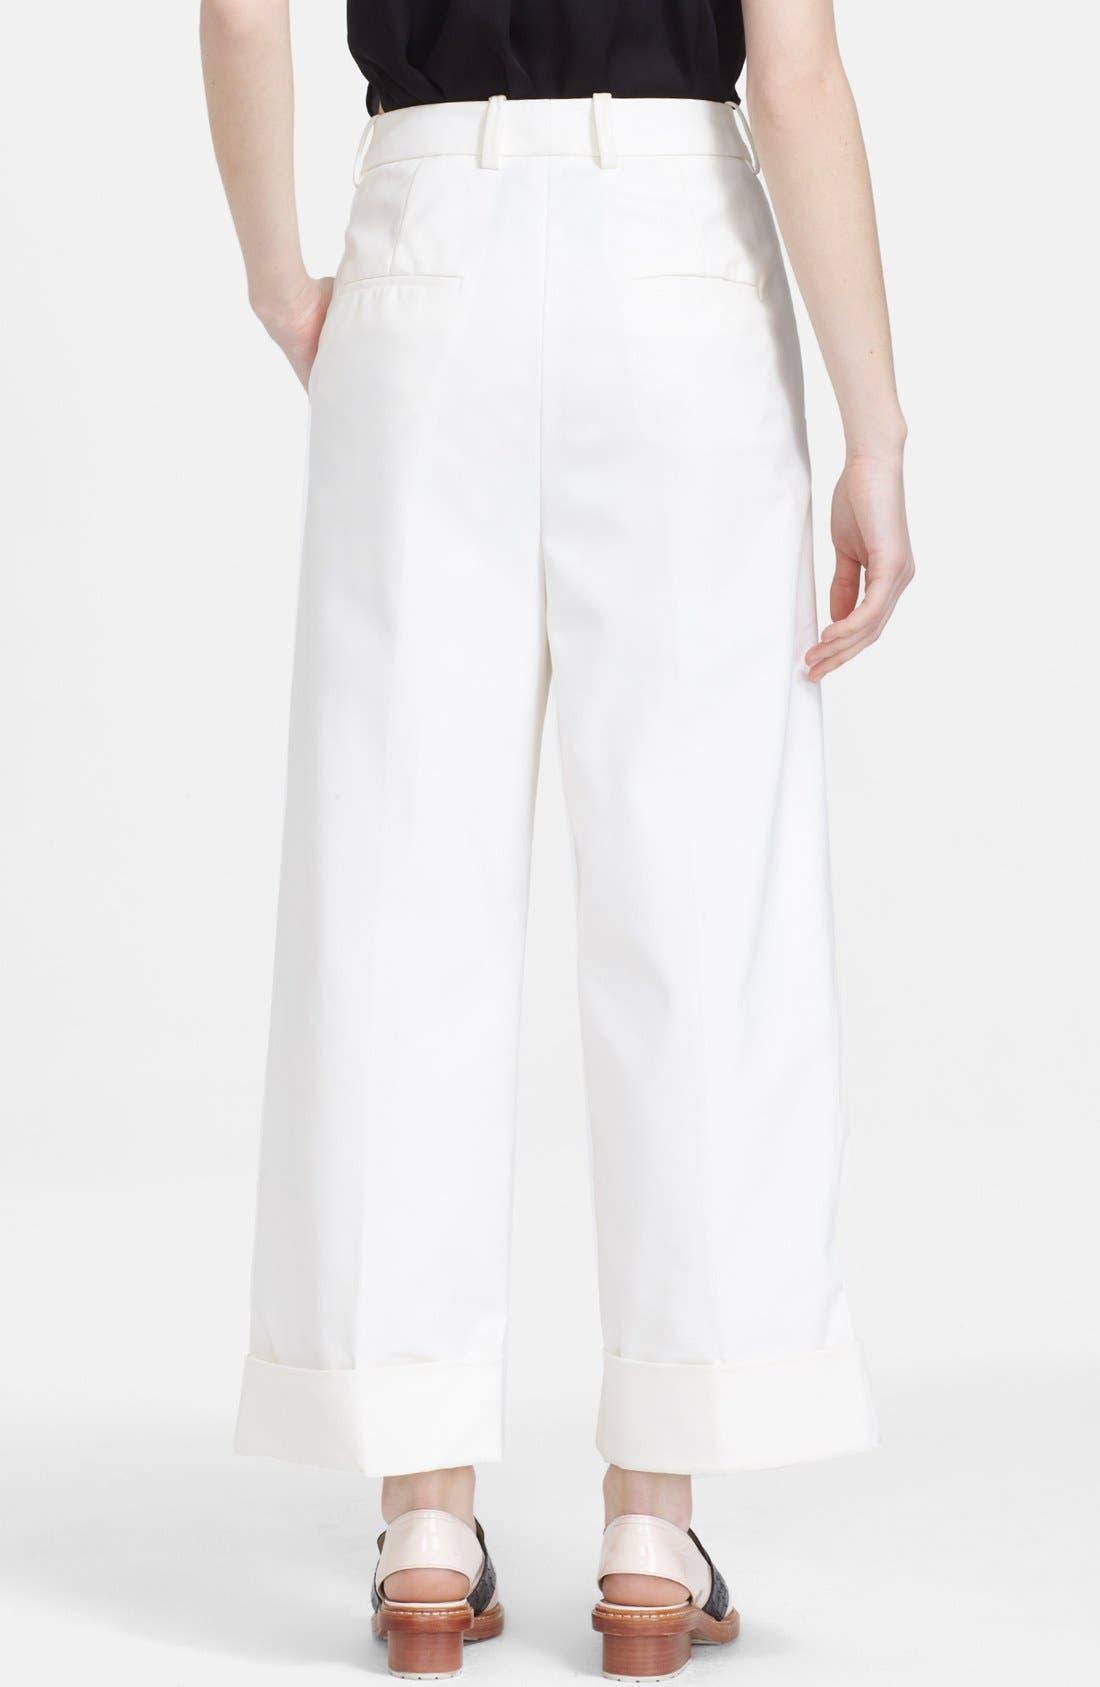 3.1 PHILLIP LIM, Cuffed Wide Leg Pants, Alternate thumbnail 3, color, 900